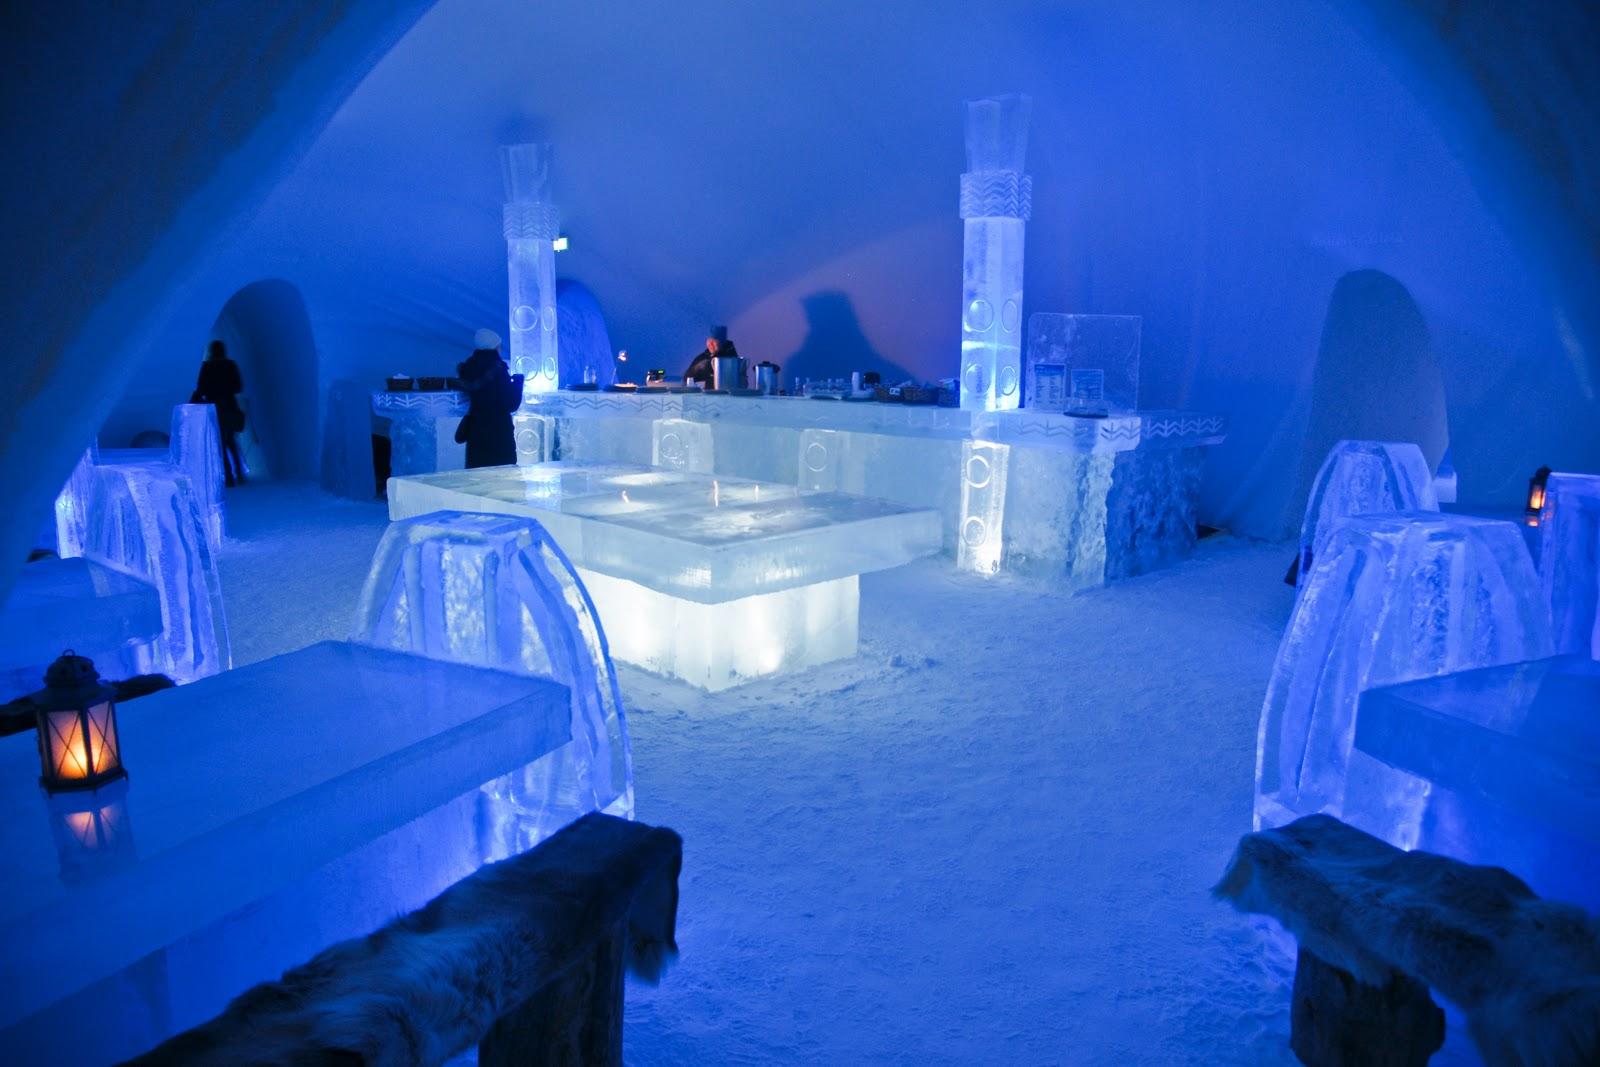 Hotel di ghiaccio in Svezia - Neomag.